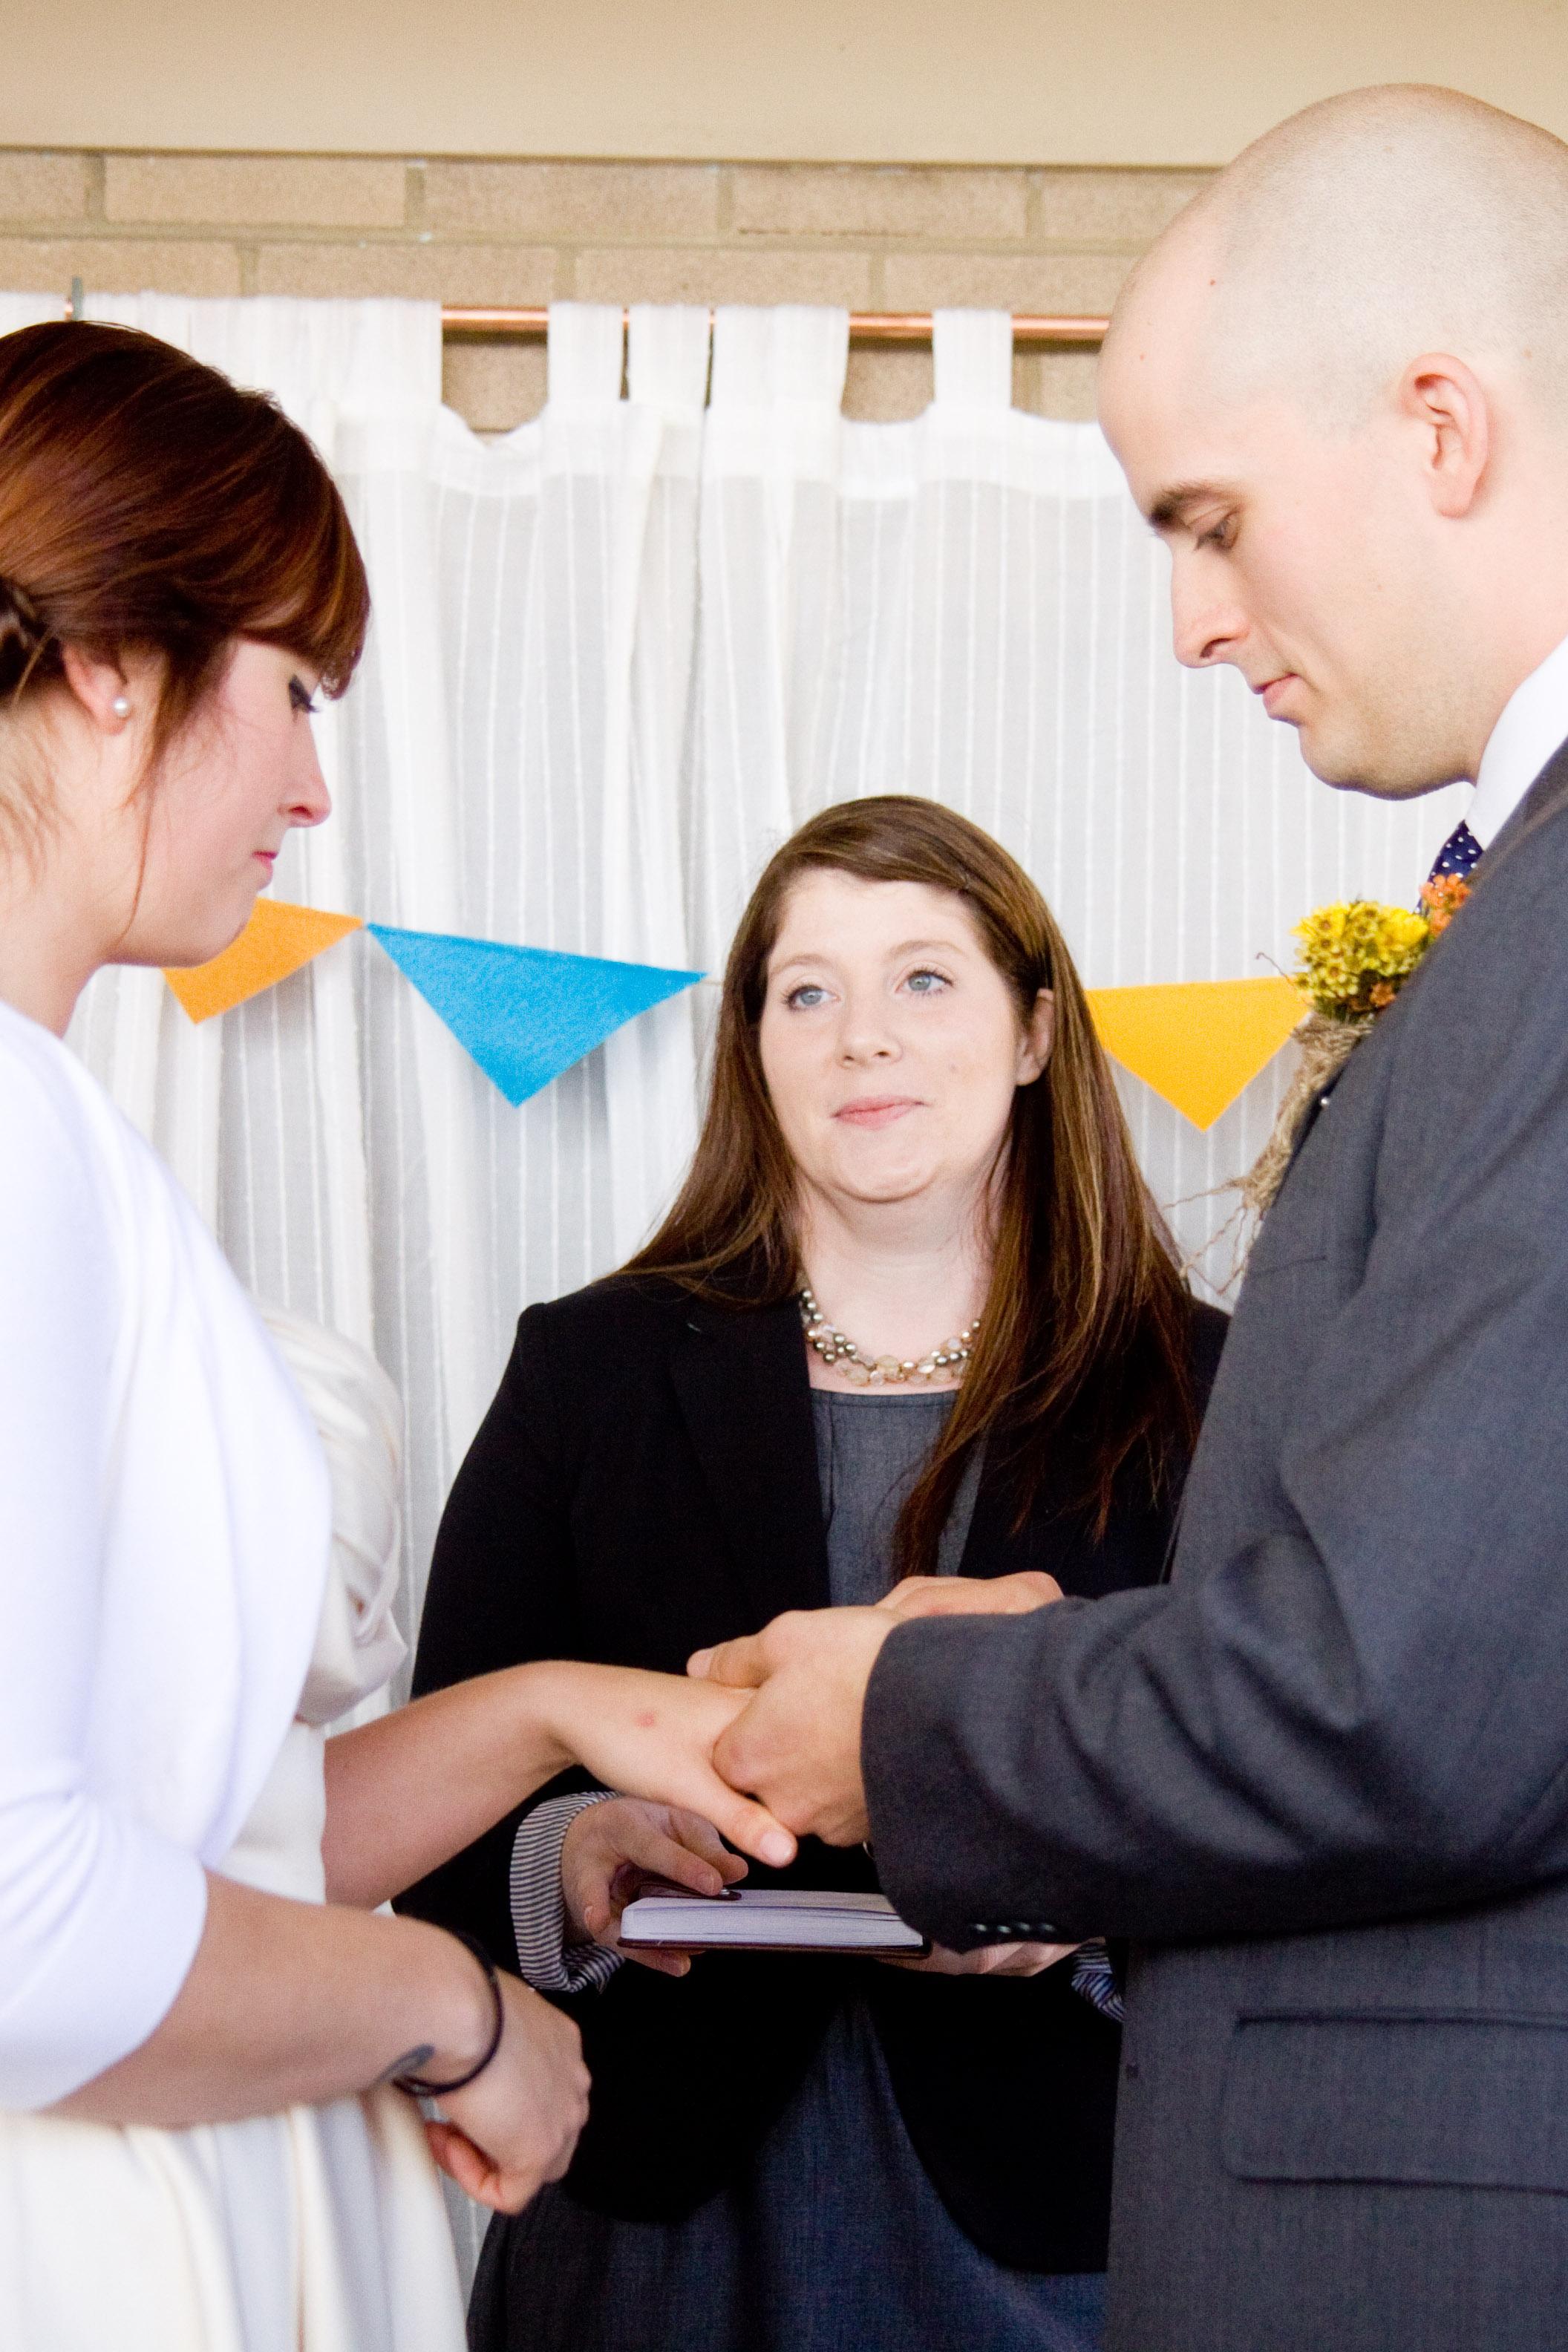 Wilson Bickel Wedding - Reception and Ceremony (111 of 526).jpg